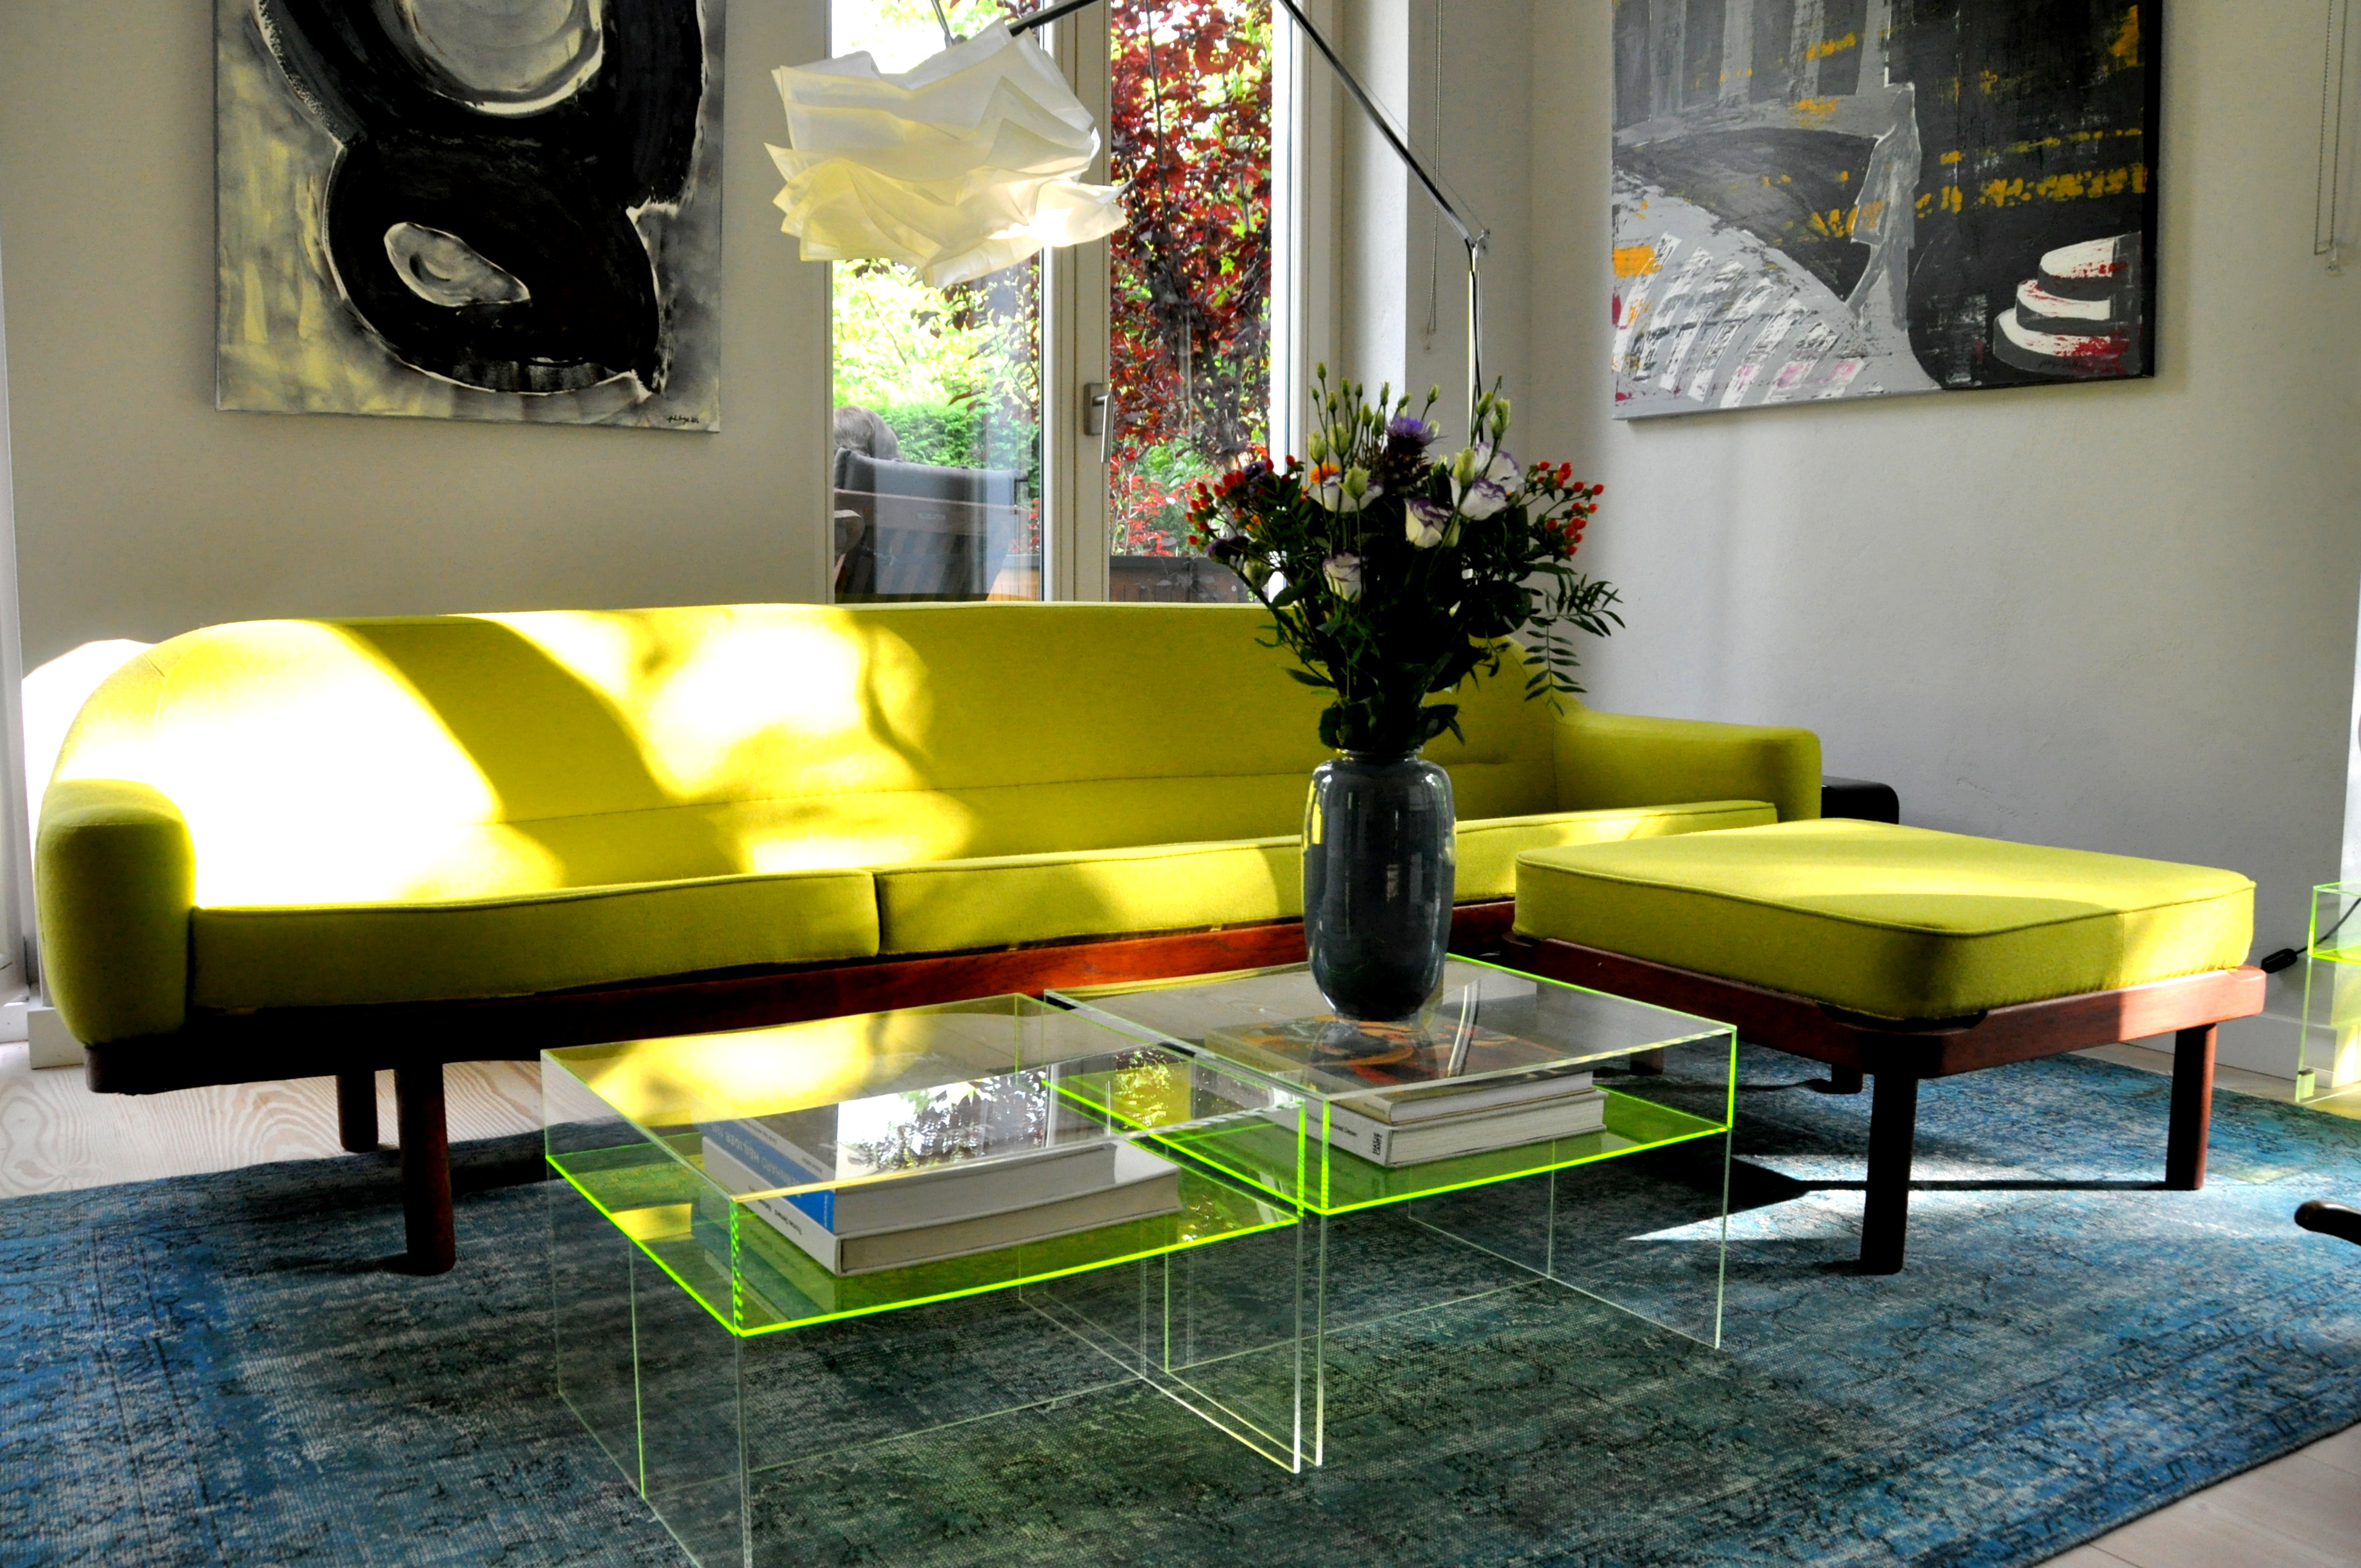 vitamin c f r den livingroom hyggelig berlin. Black Bedroom Furniture Sets. Home Design Ideas